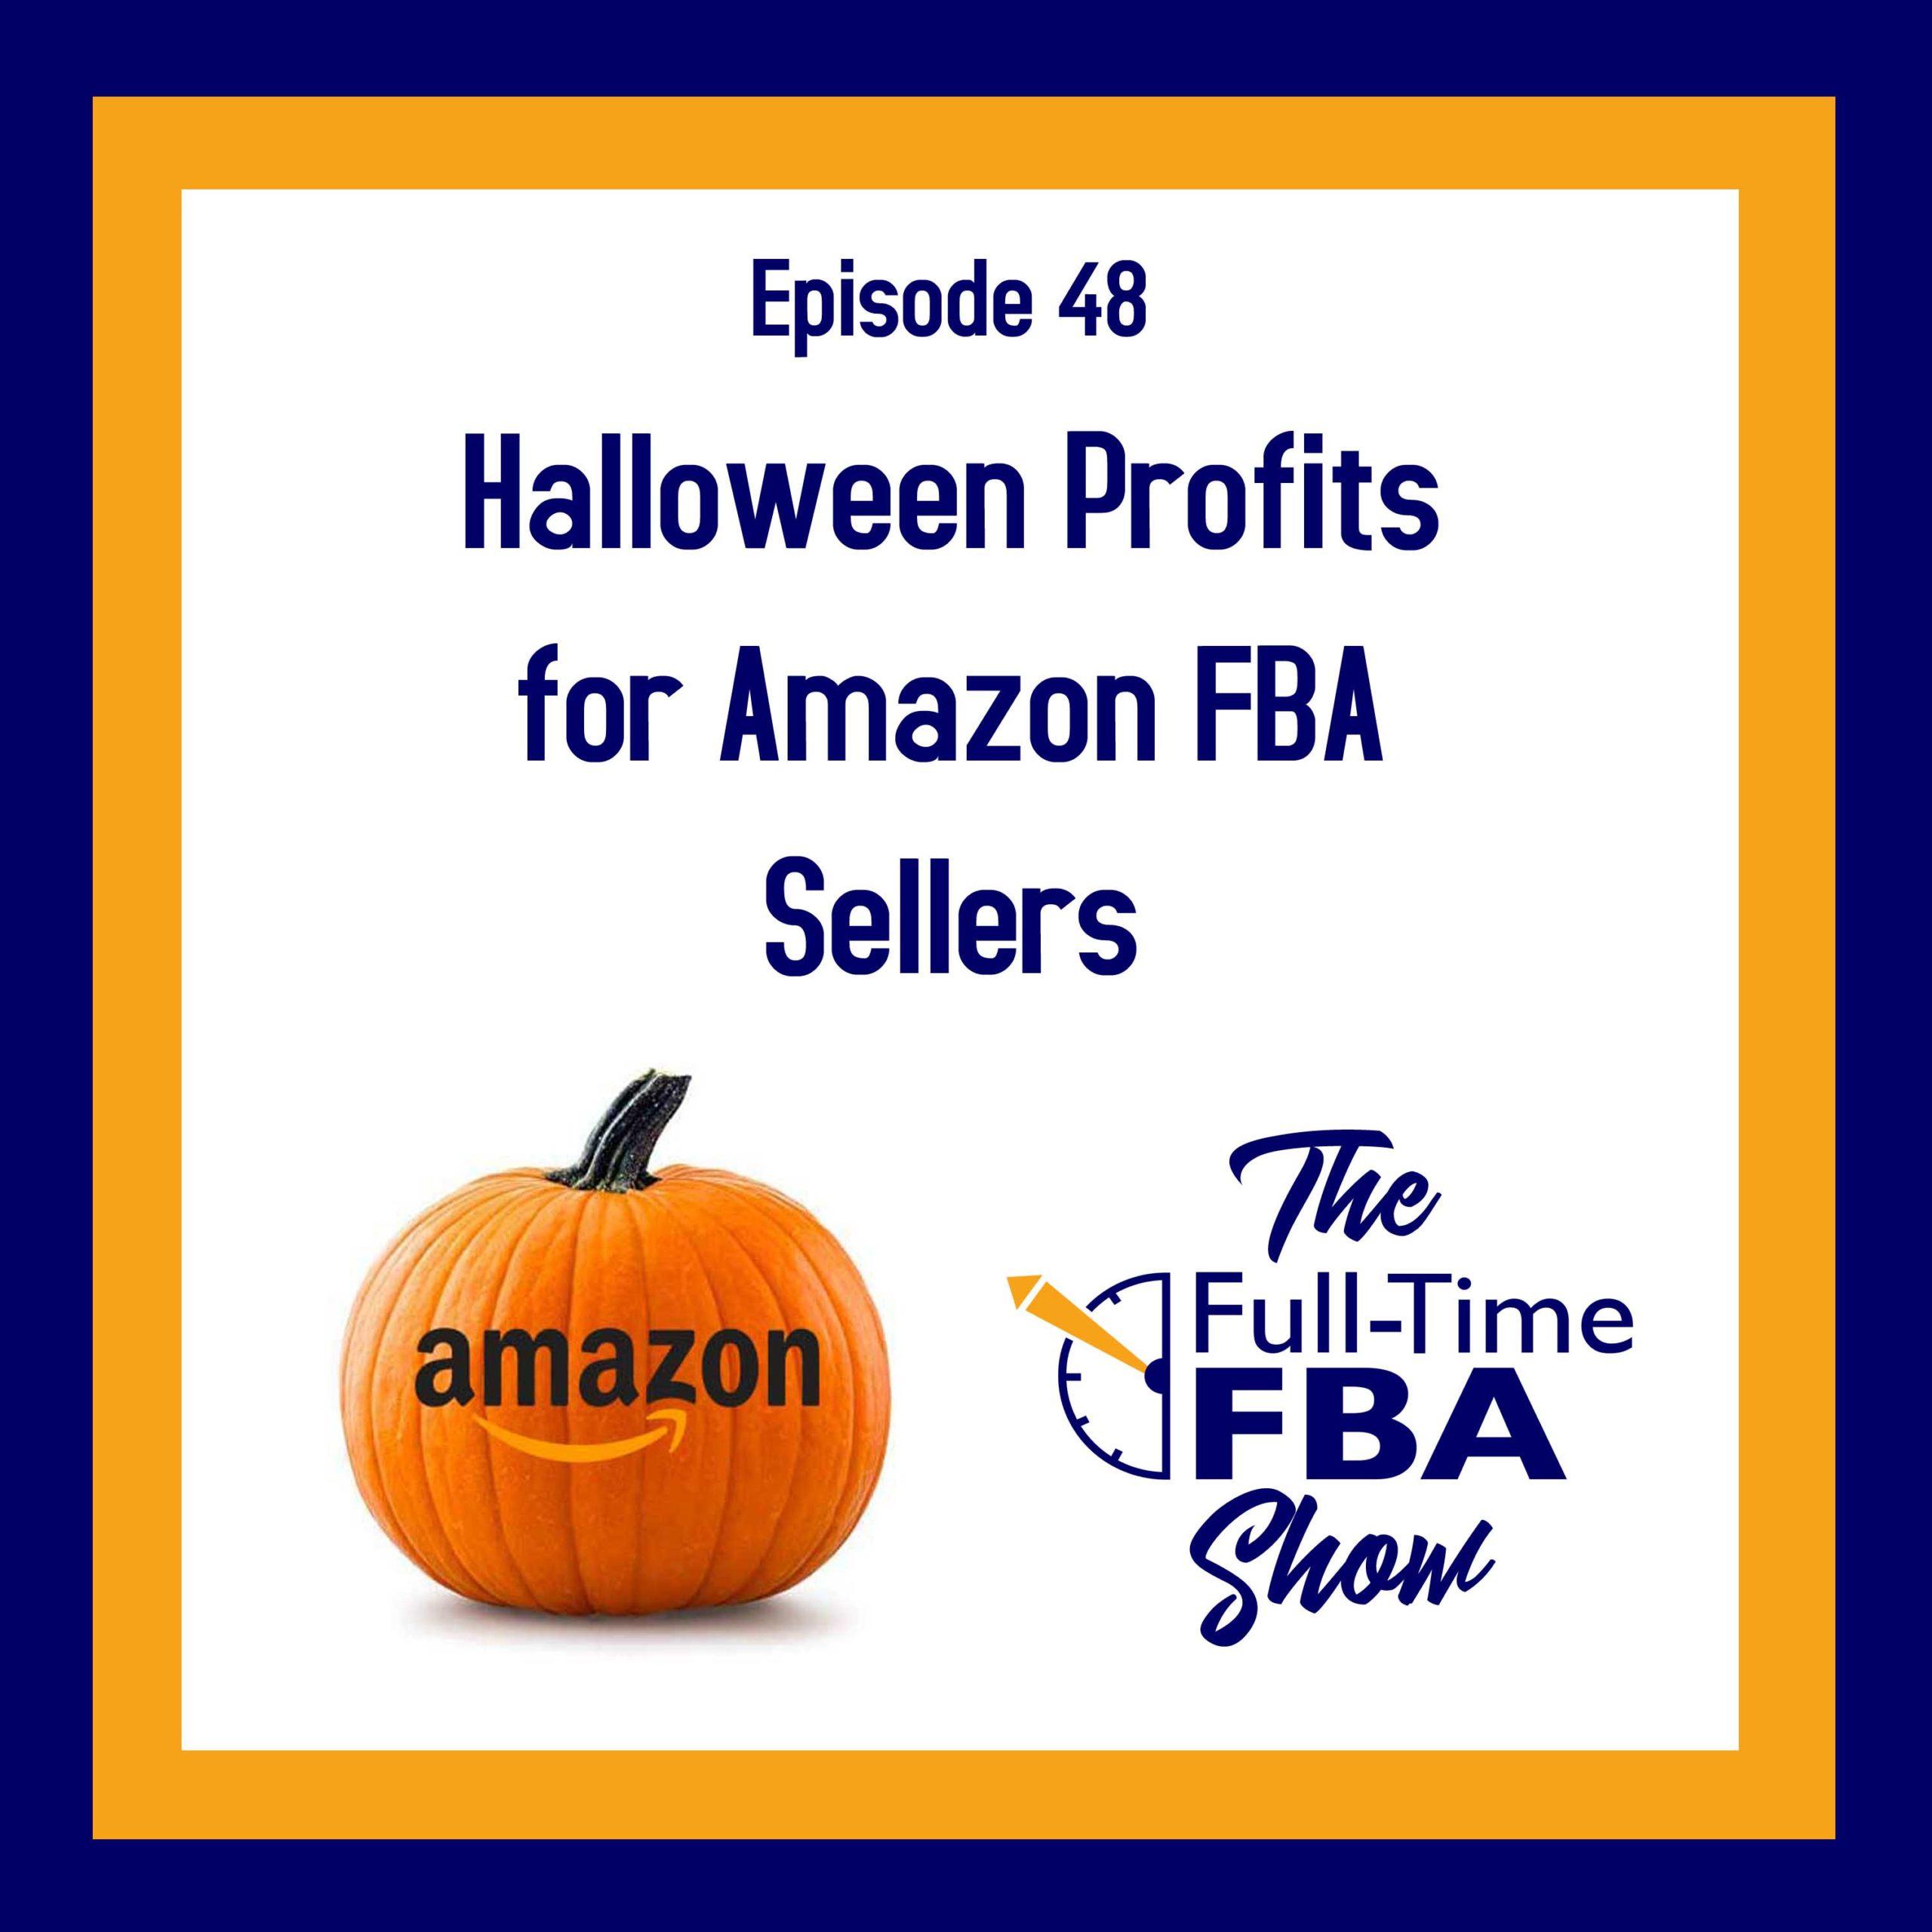 Halloween 2020 Opening Profit Podcast Episode 048 : Halloween Profits for Amazon FBA Sellers